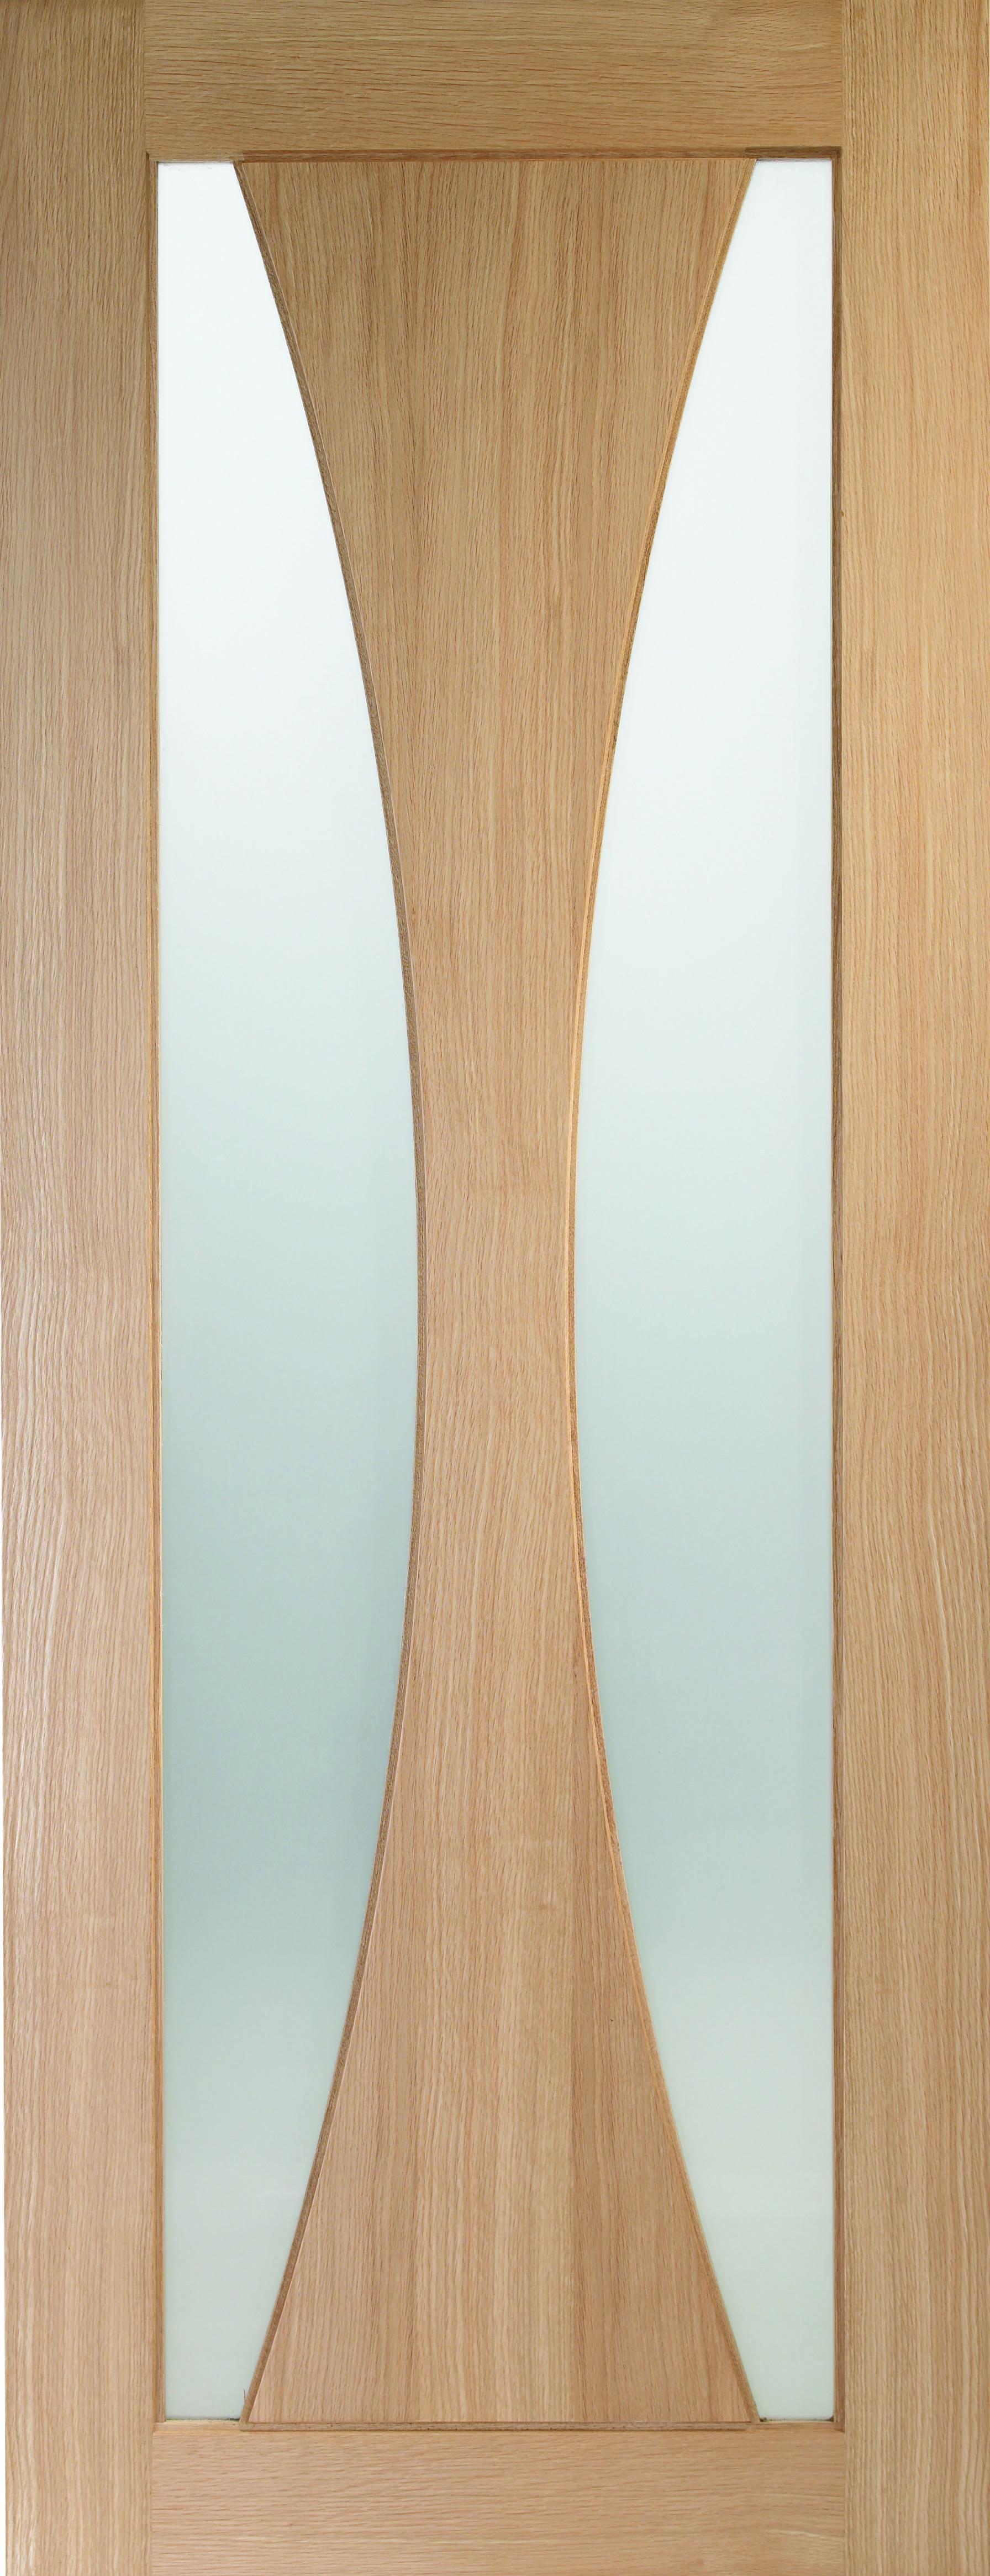 Oak Verona with Clear Glass.jpg